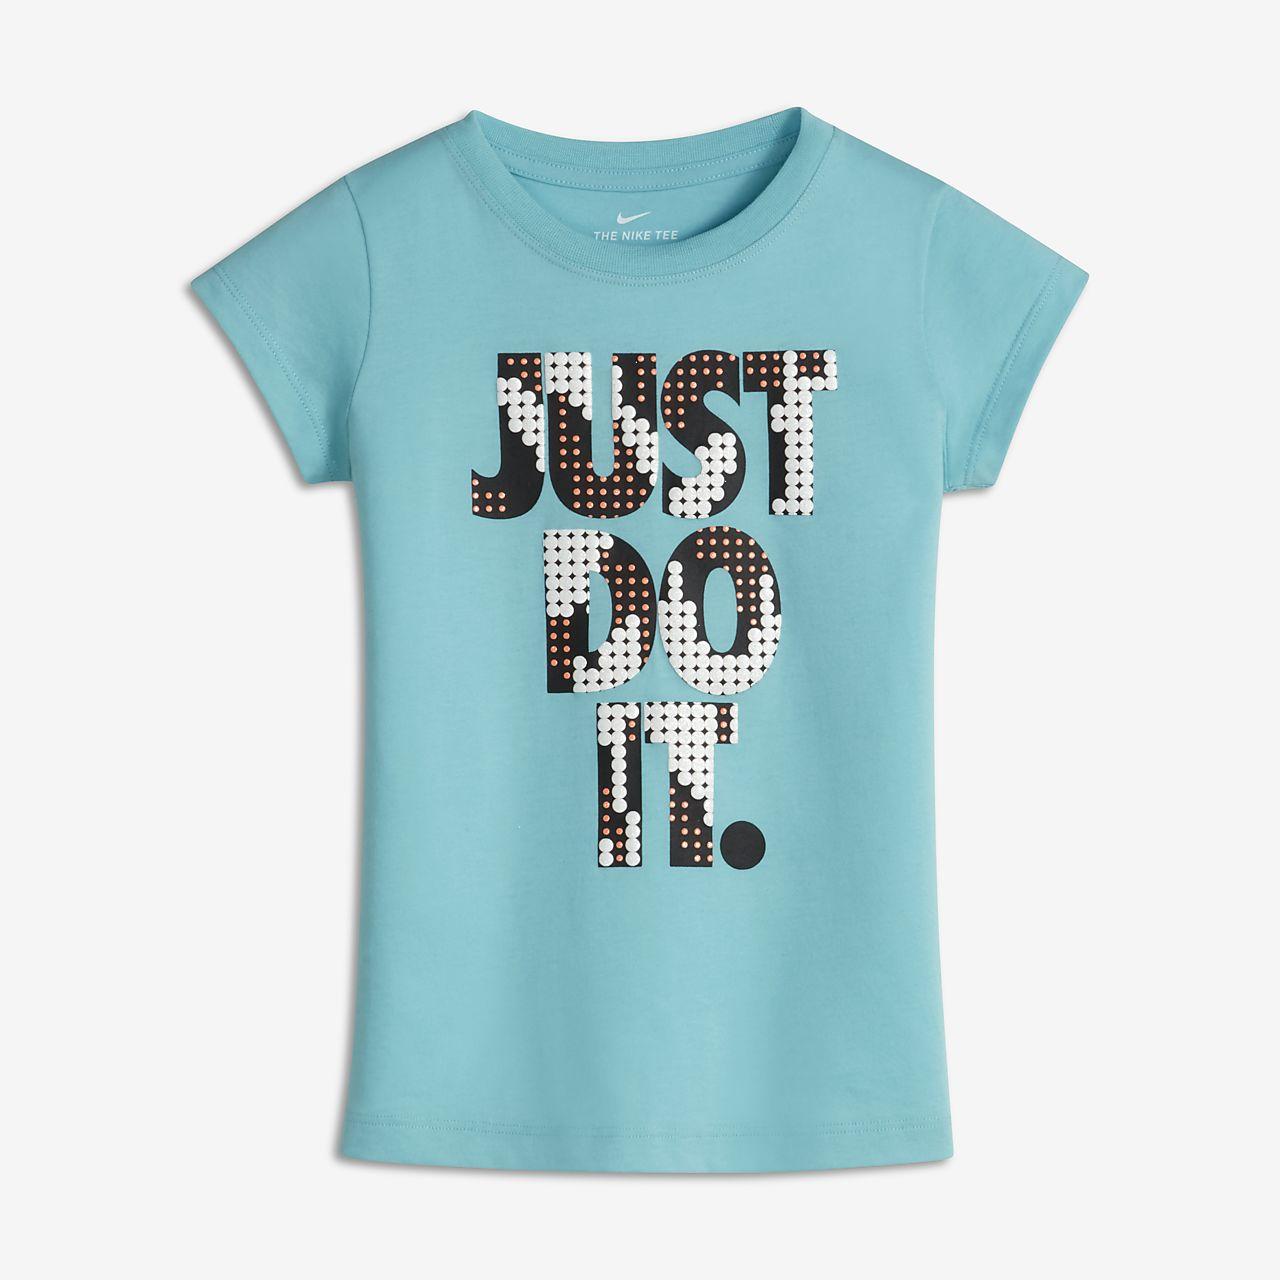 nike just do it little kids girls tshirt nikecom